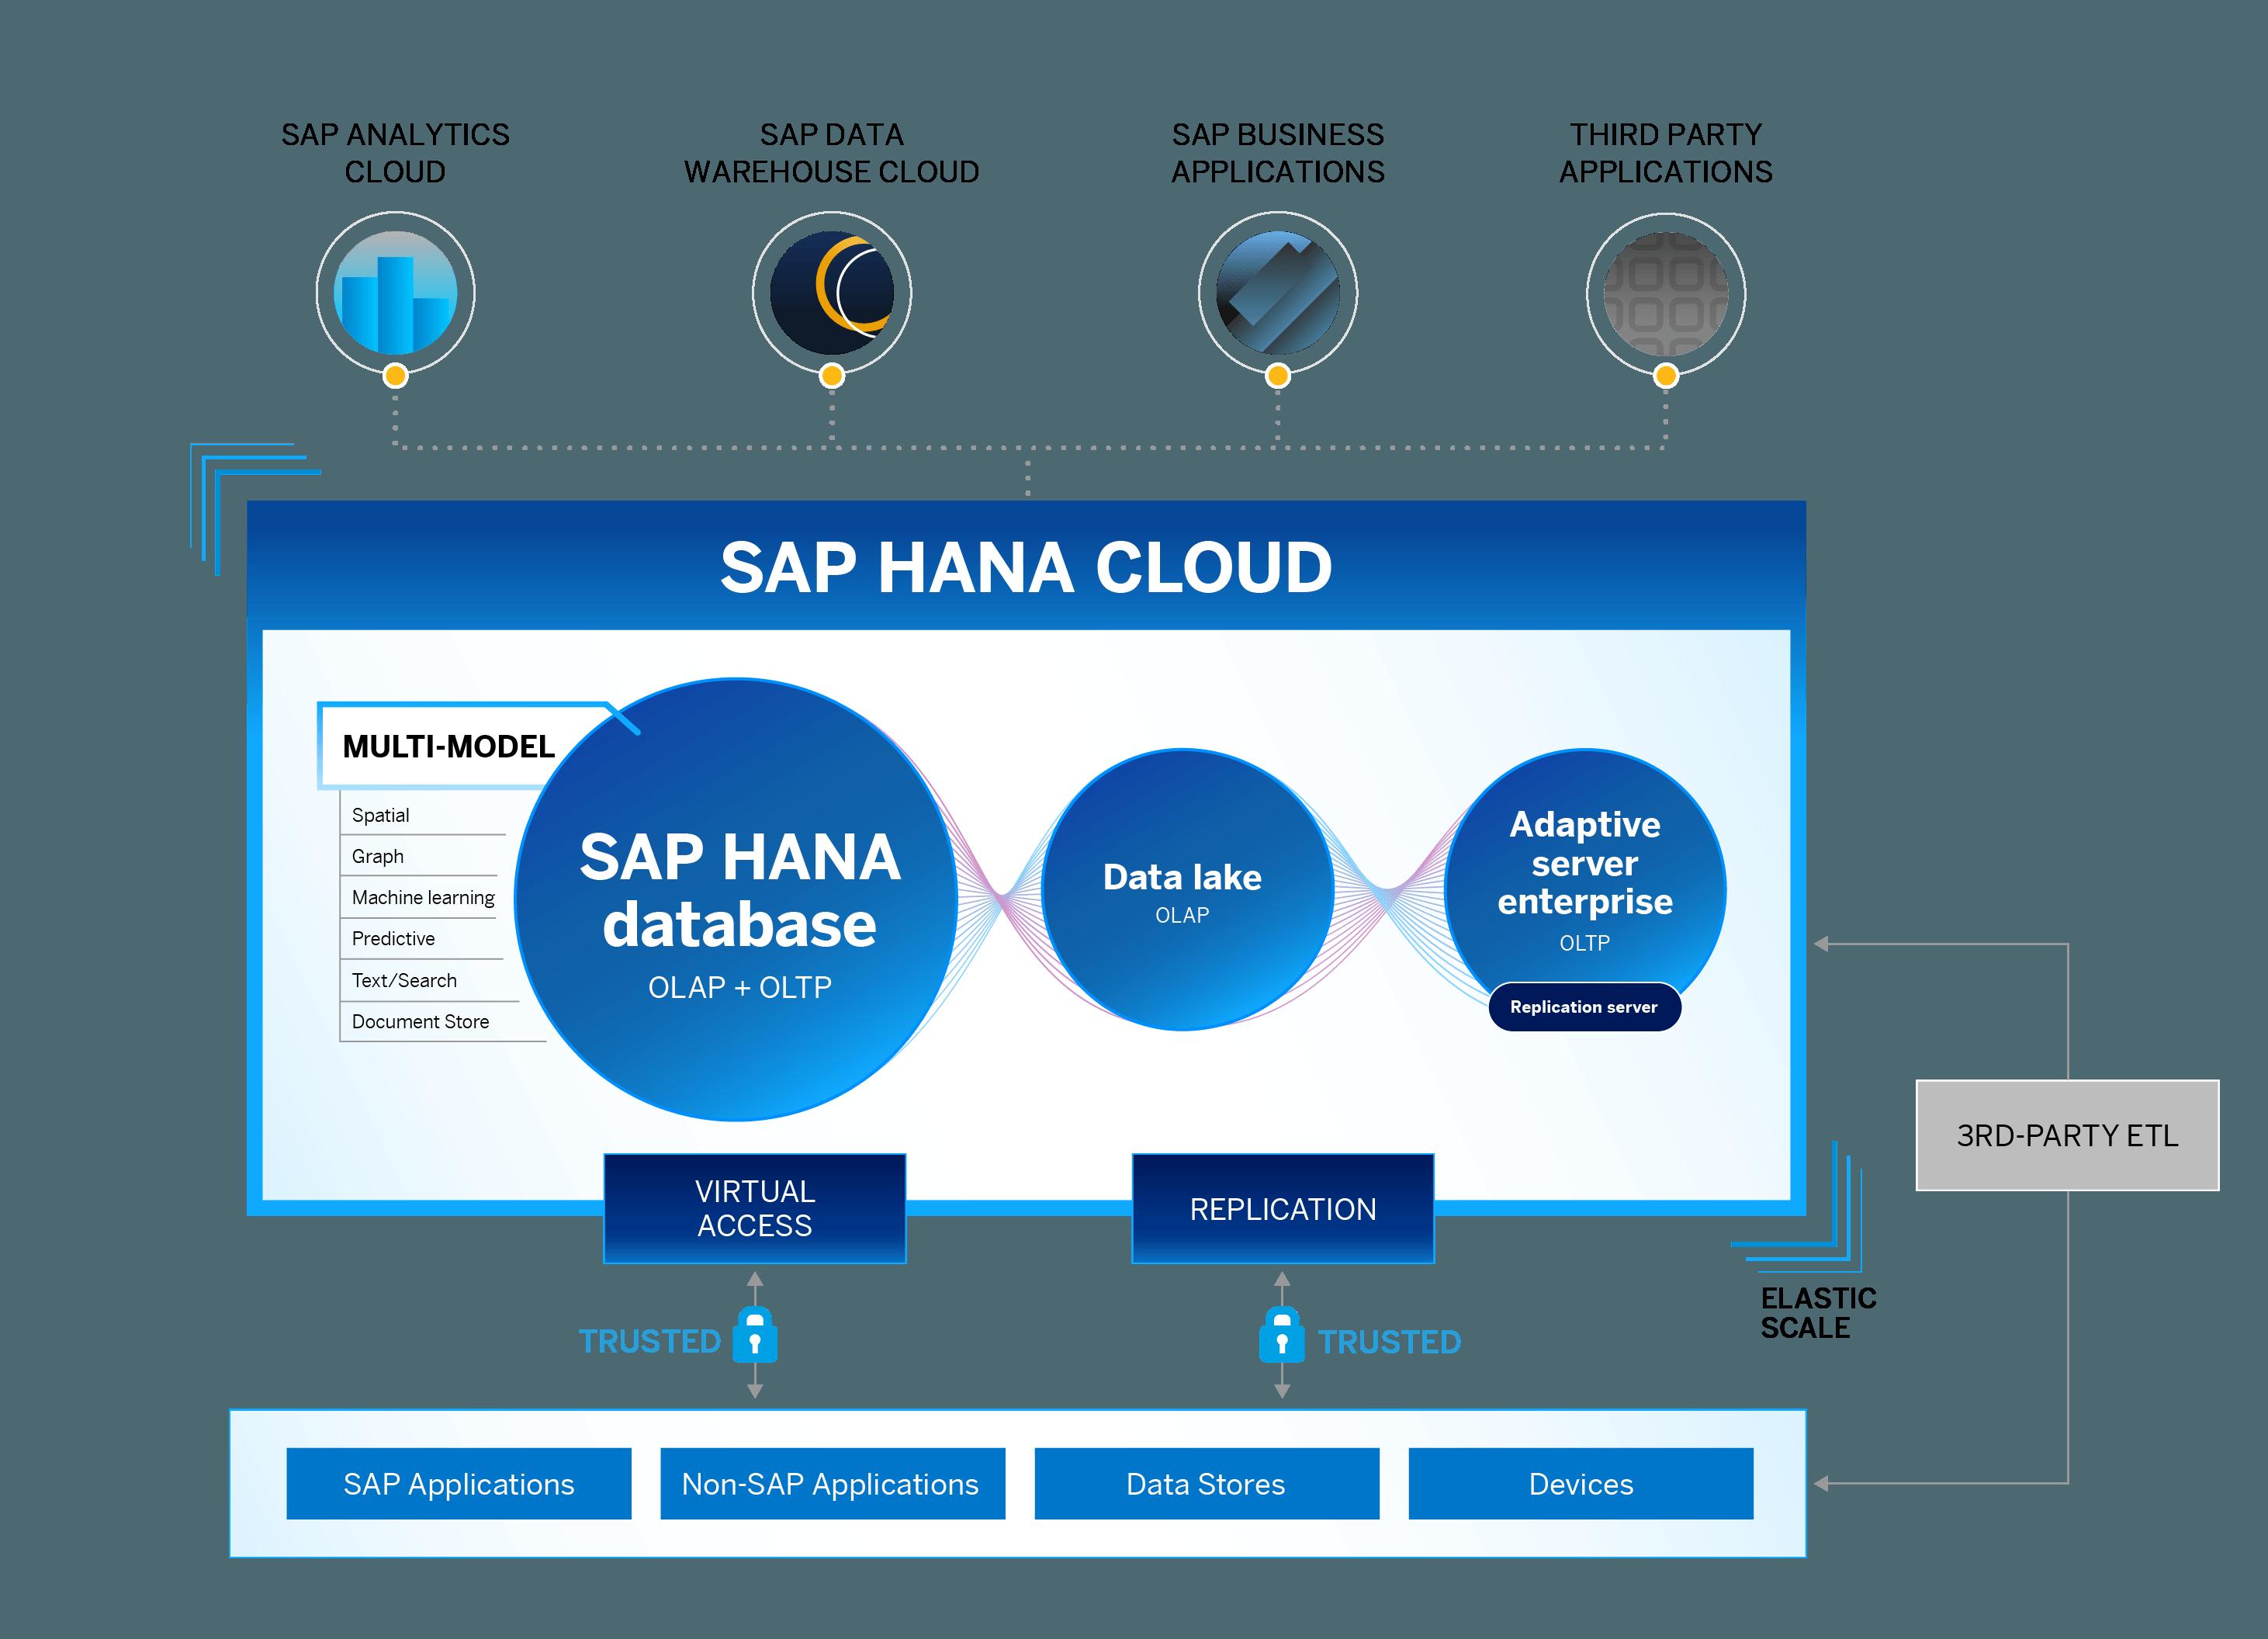 New SAP Sybase capabilities in SAP HANA Cloud